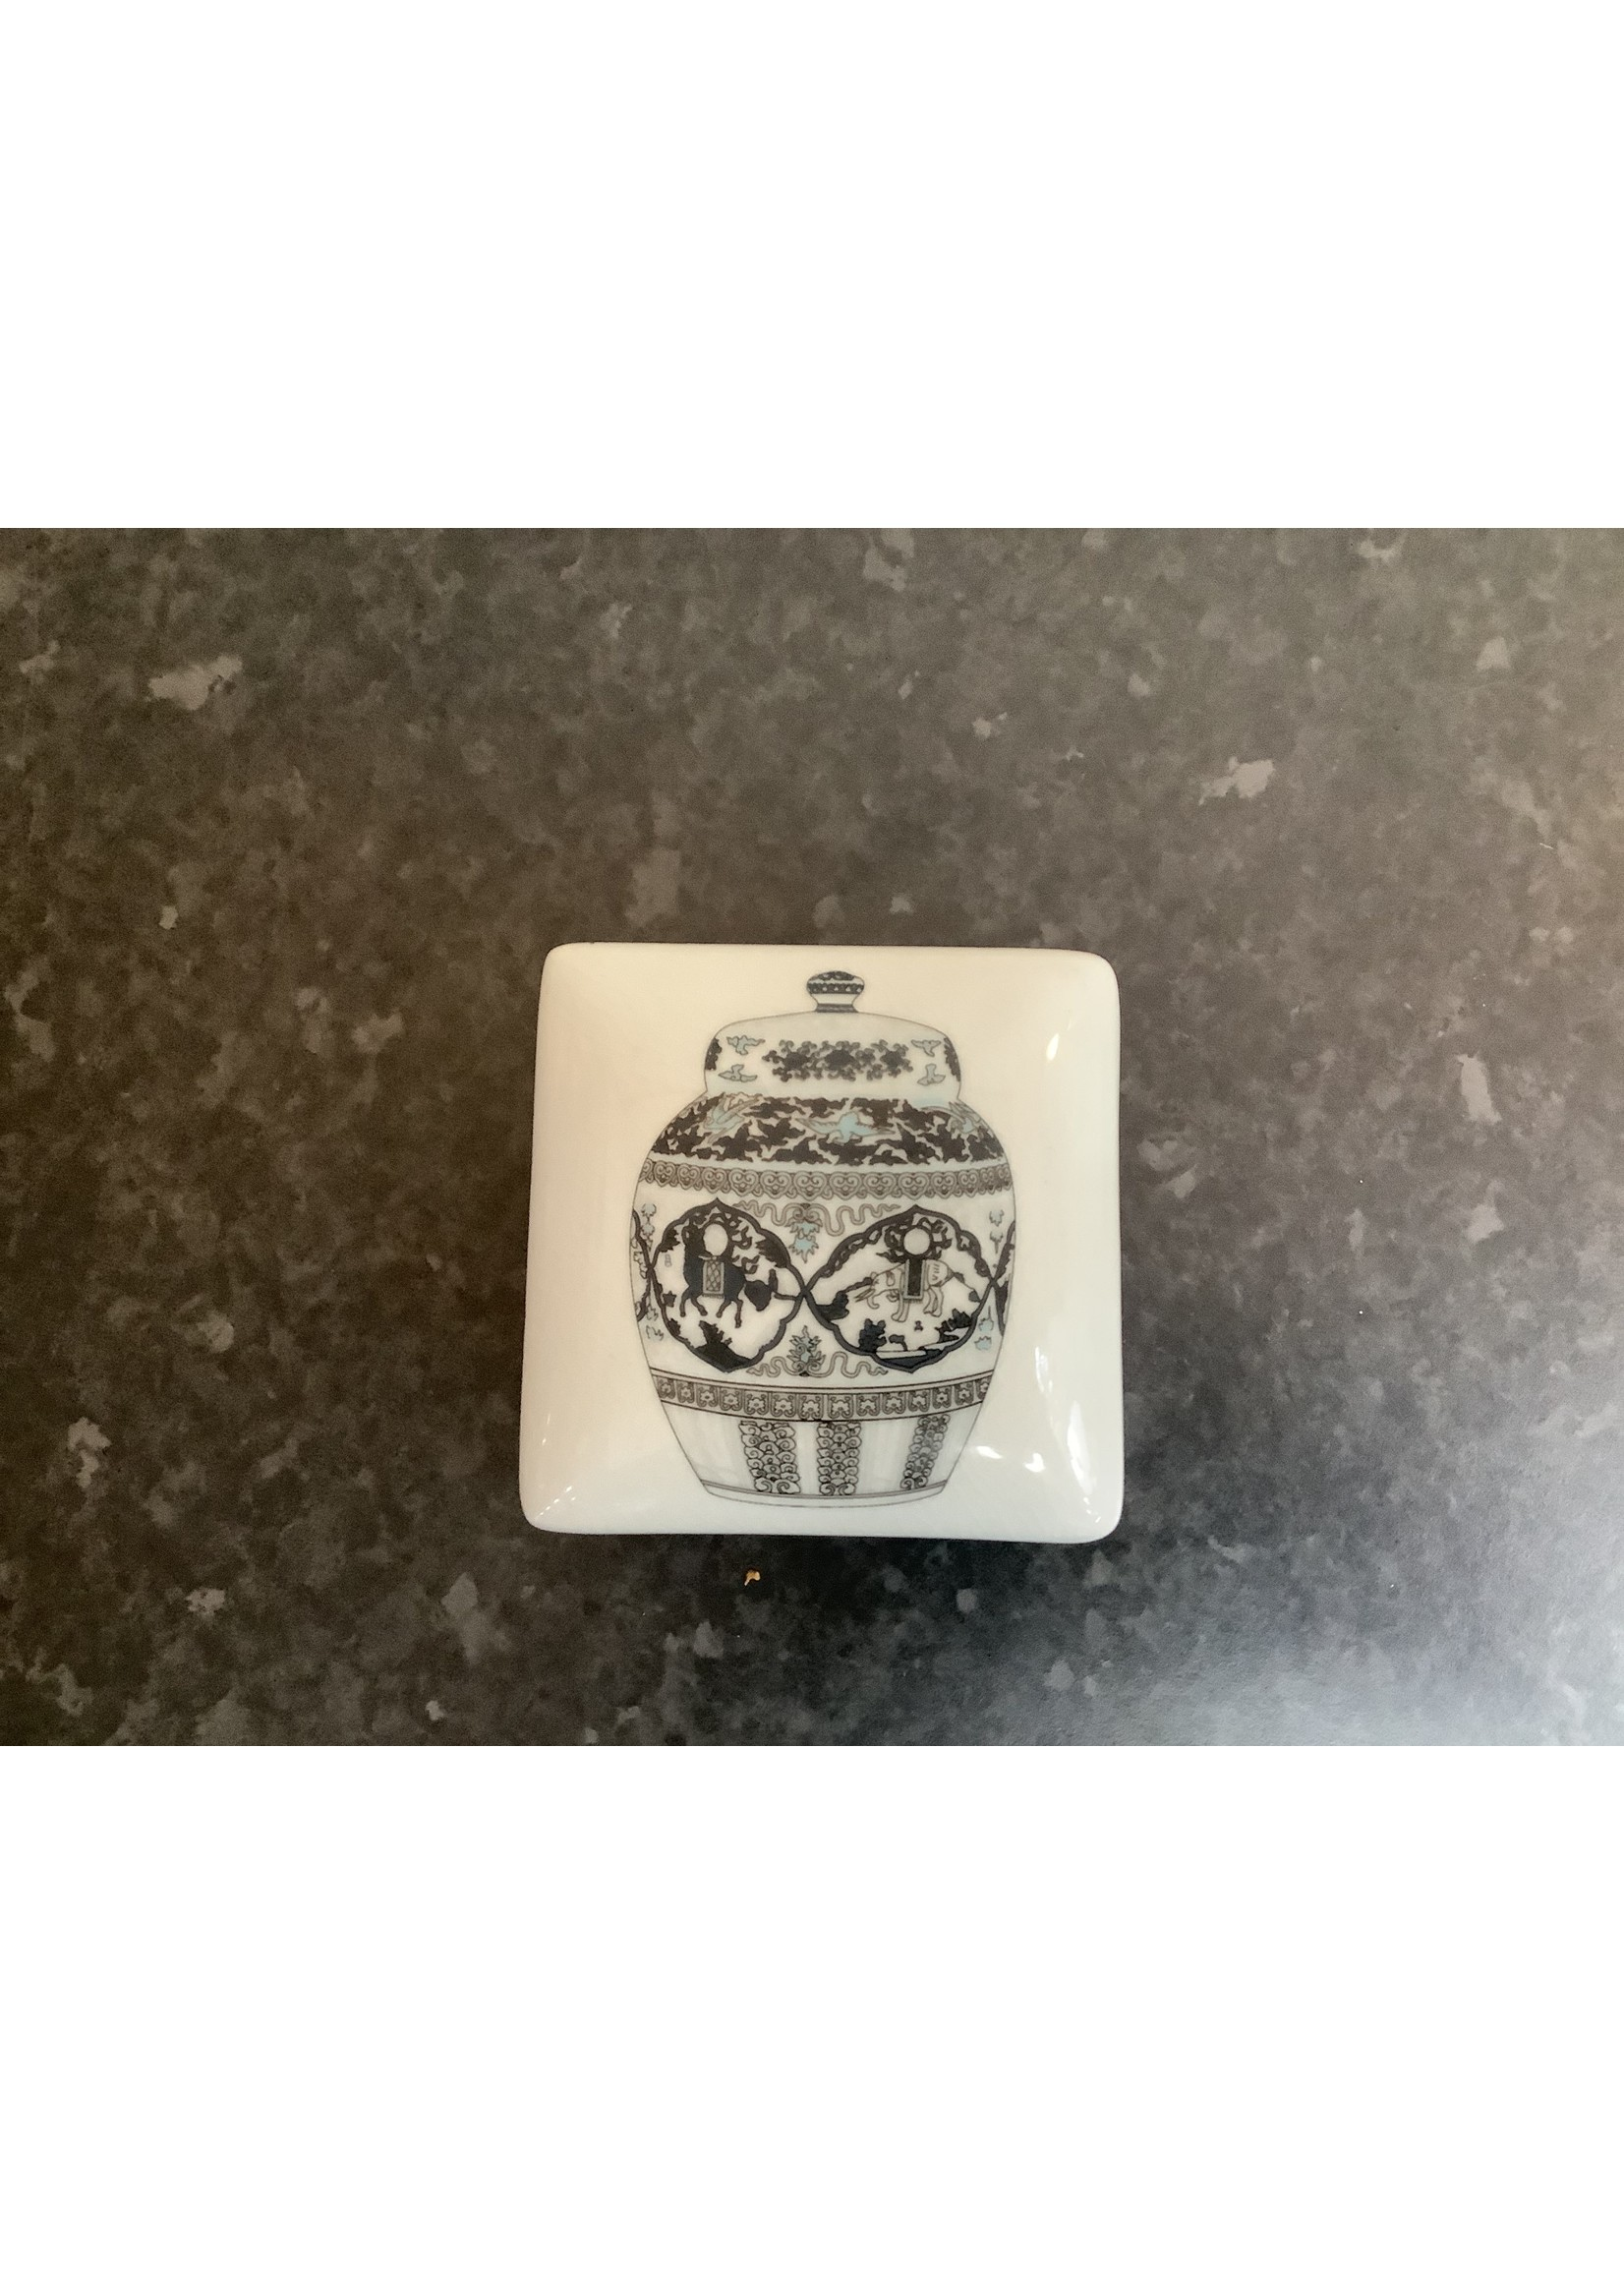 Chinese trinket box 10x10cm